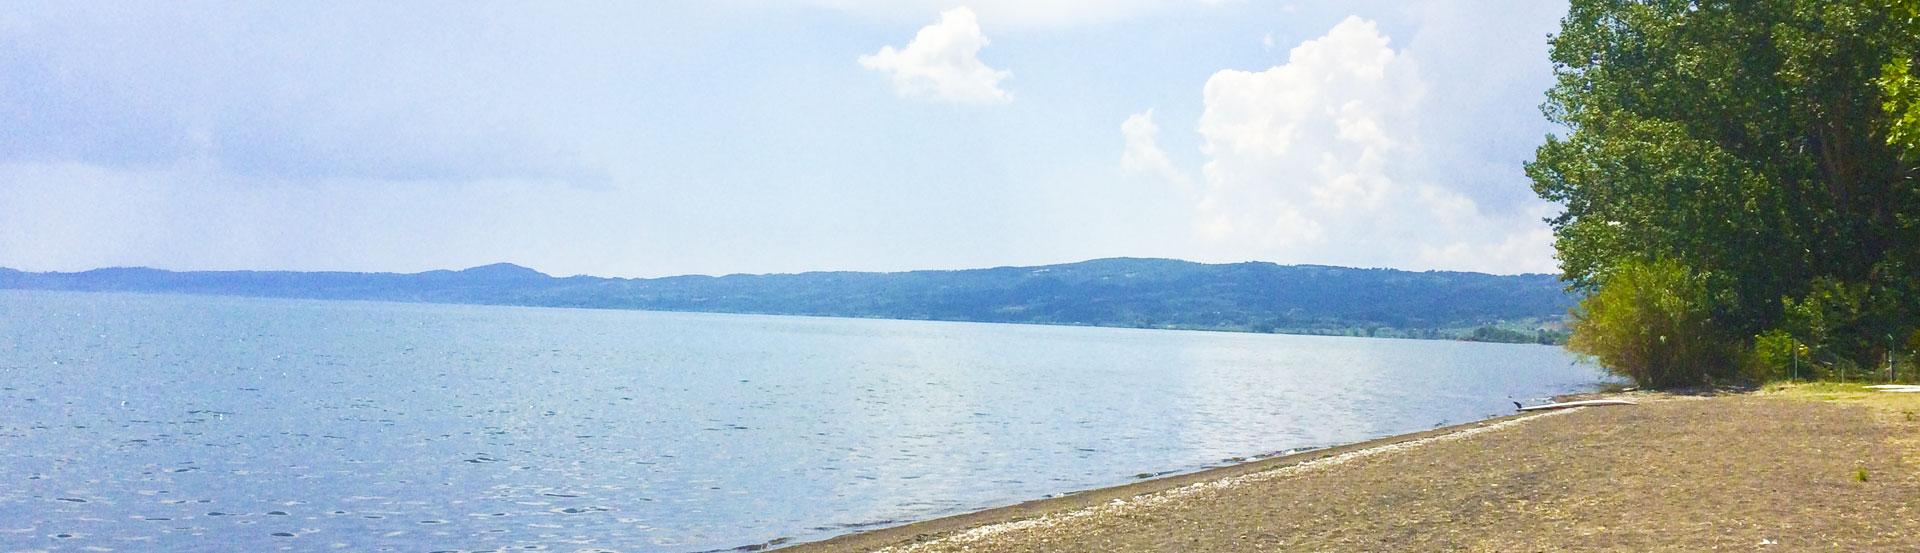 camping-valdisole-bolsena-lake-1920-553-05